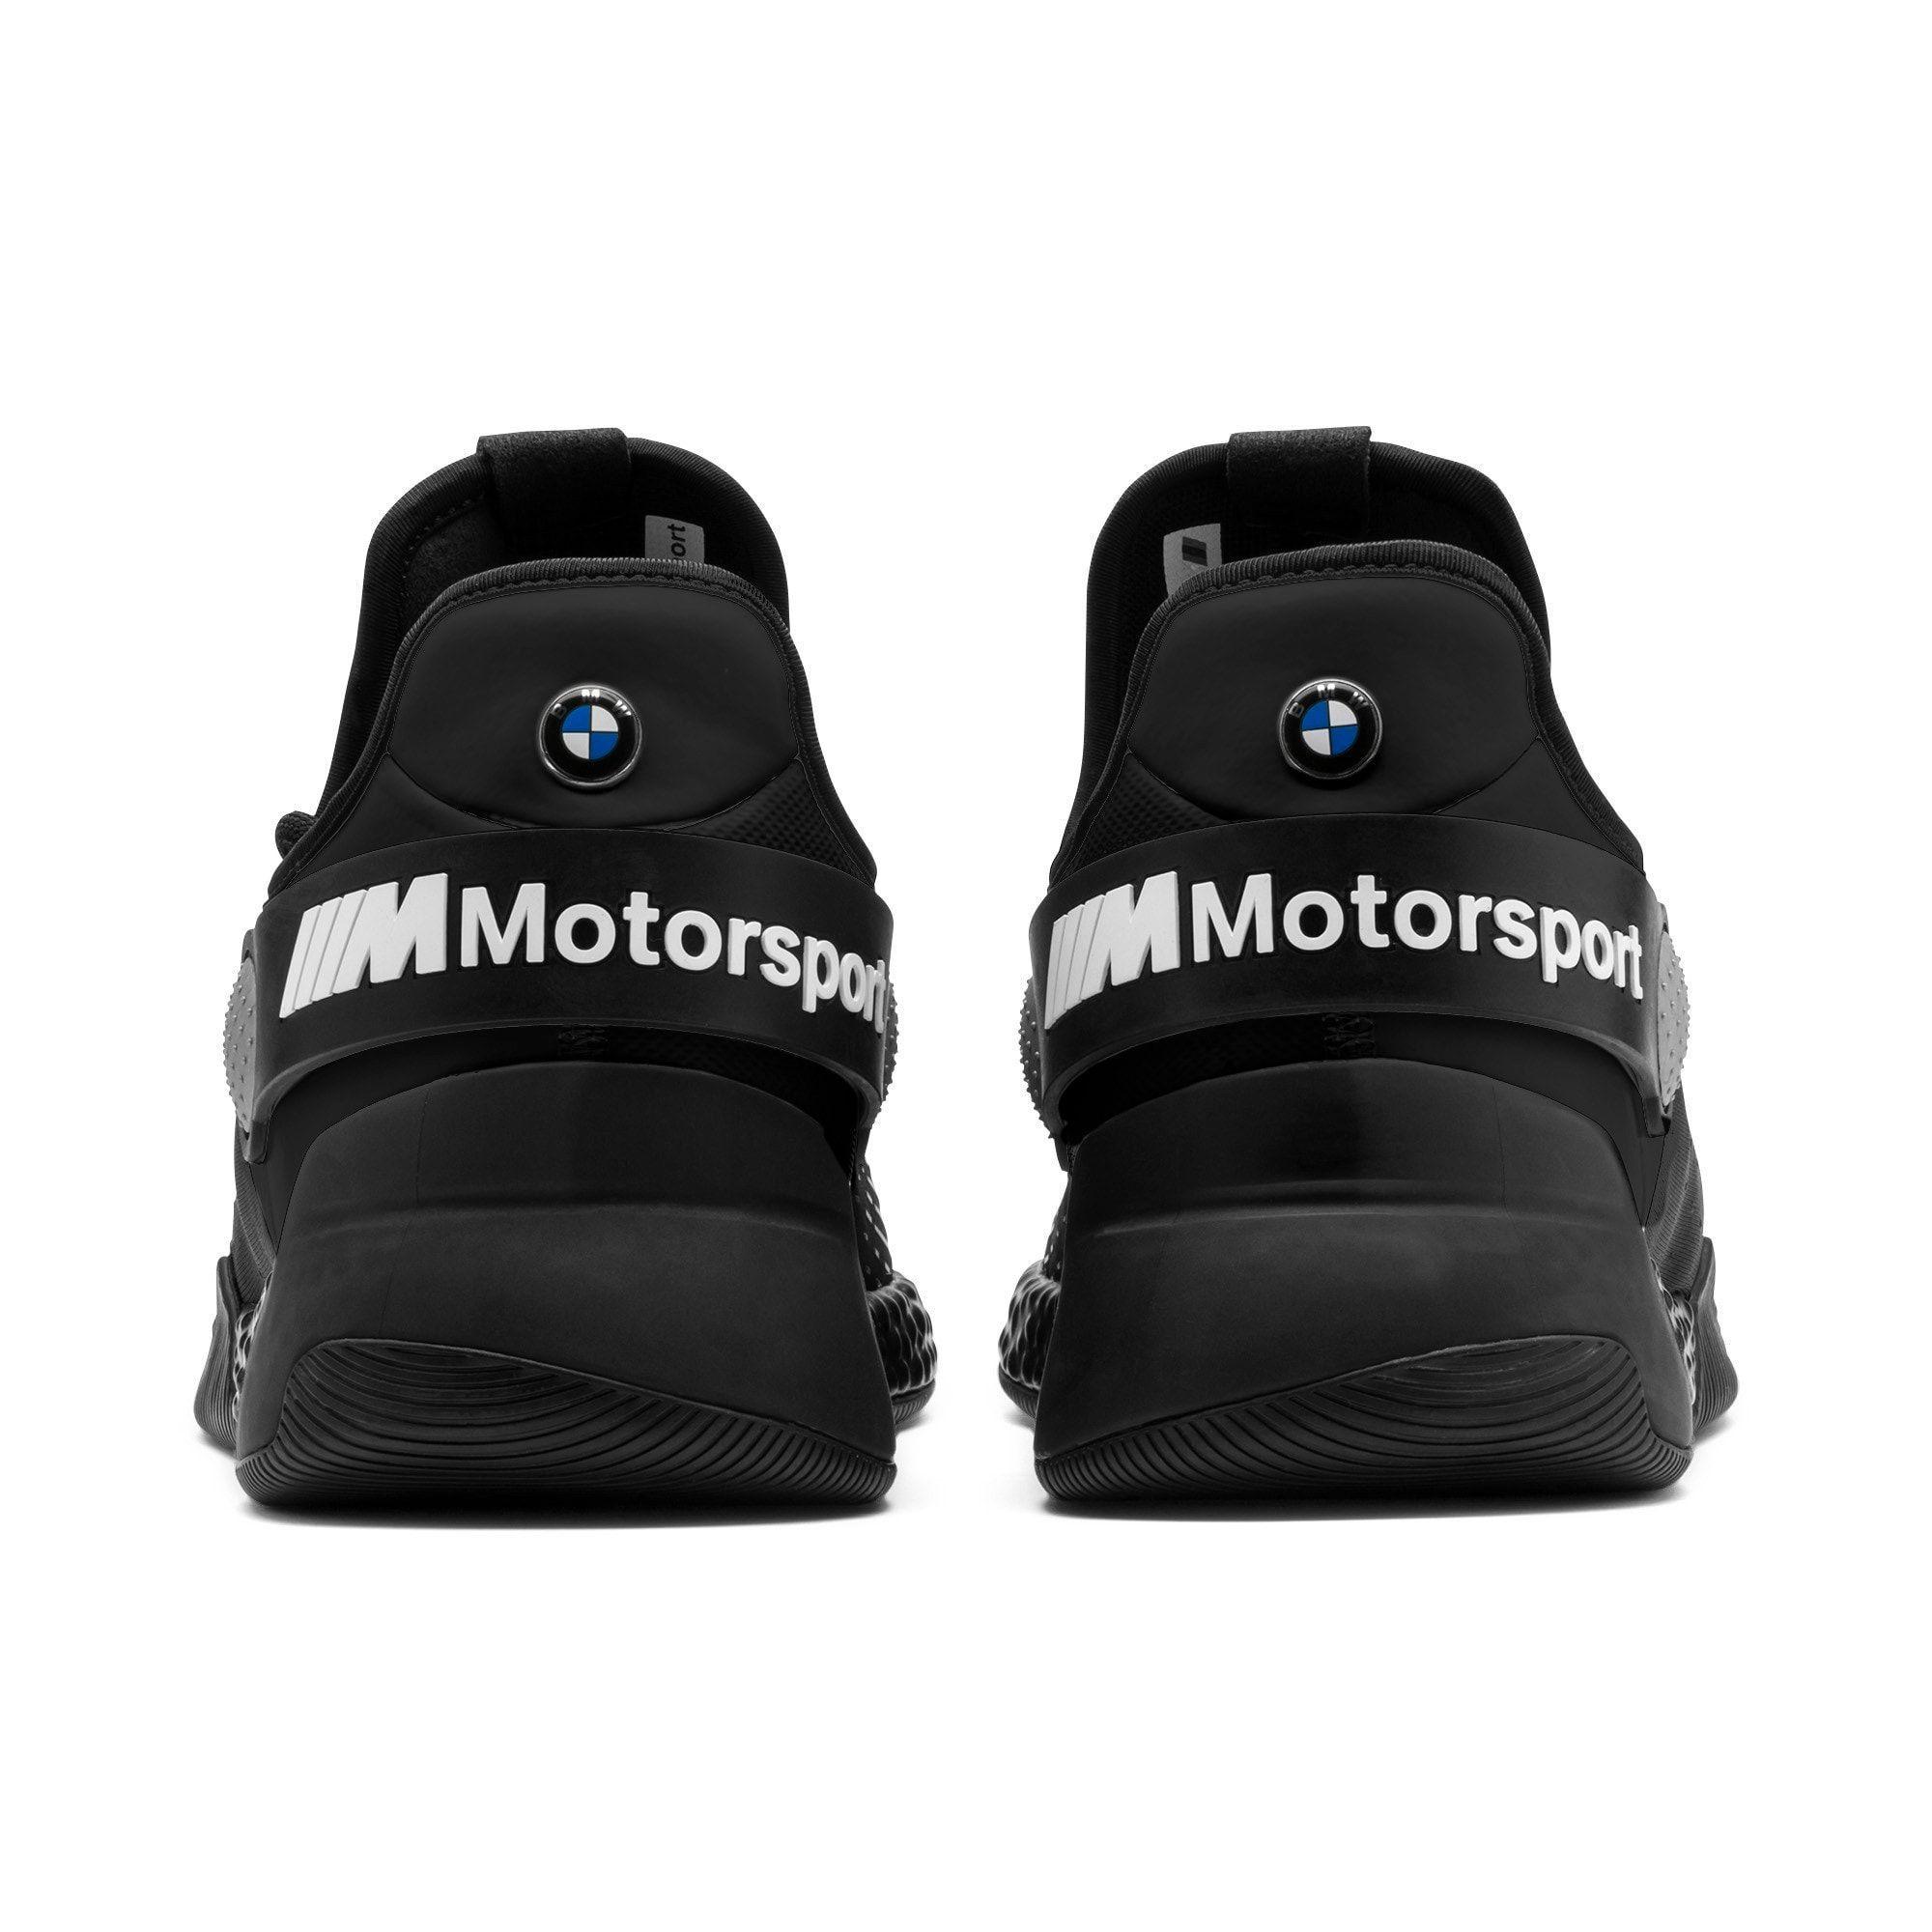 PUMA BMW M Motorsport HYBRID Basketball